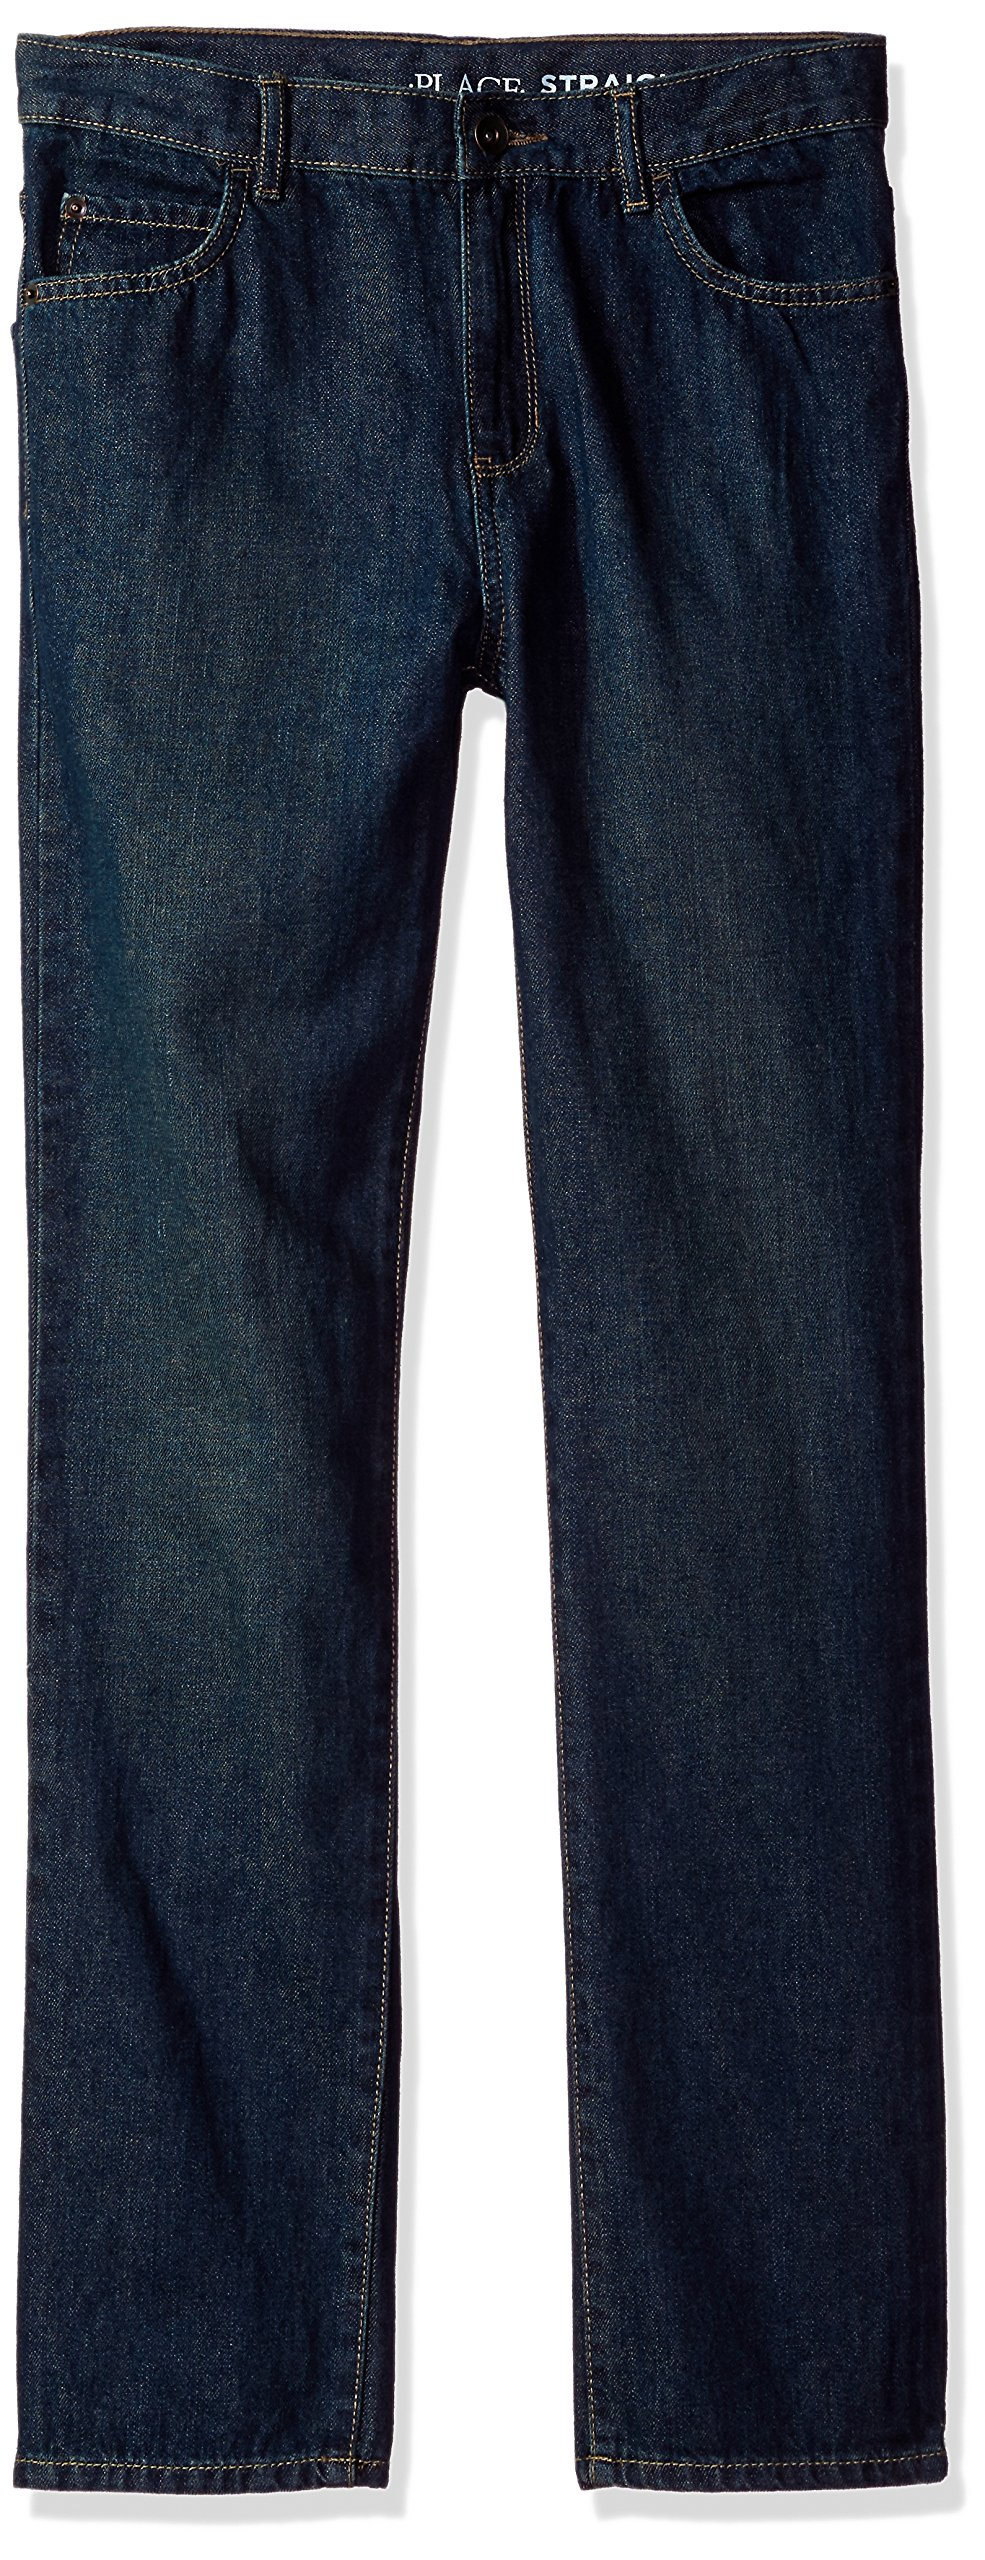 The Children's Place Big Boys' Straight Leg Jeans, Dry Indigo, 16S